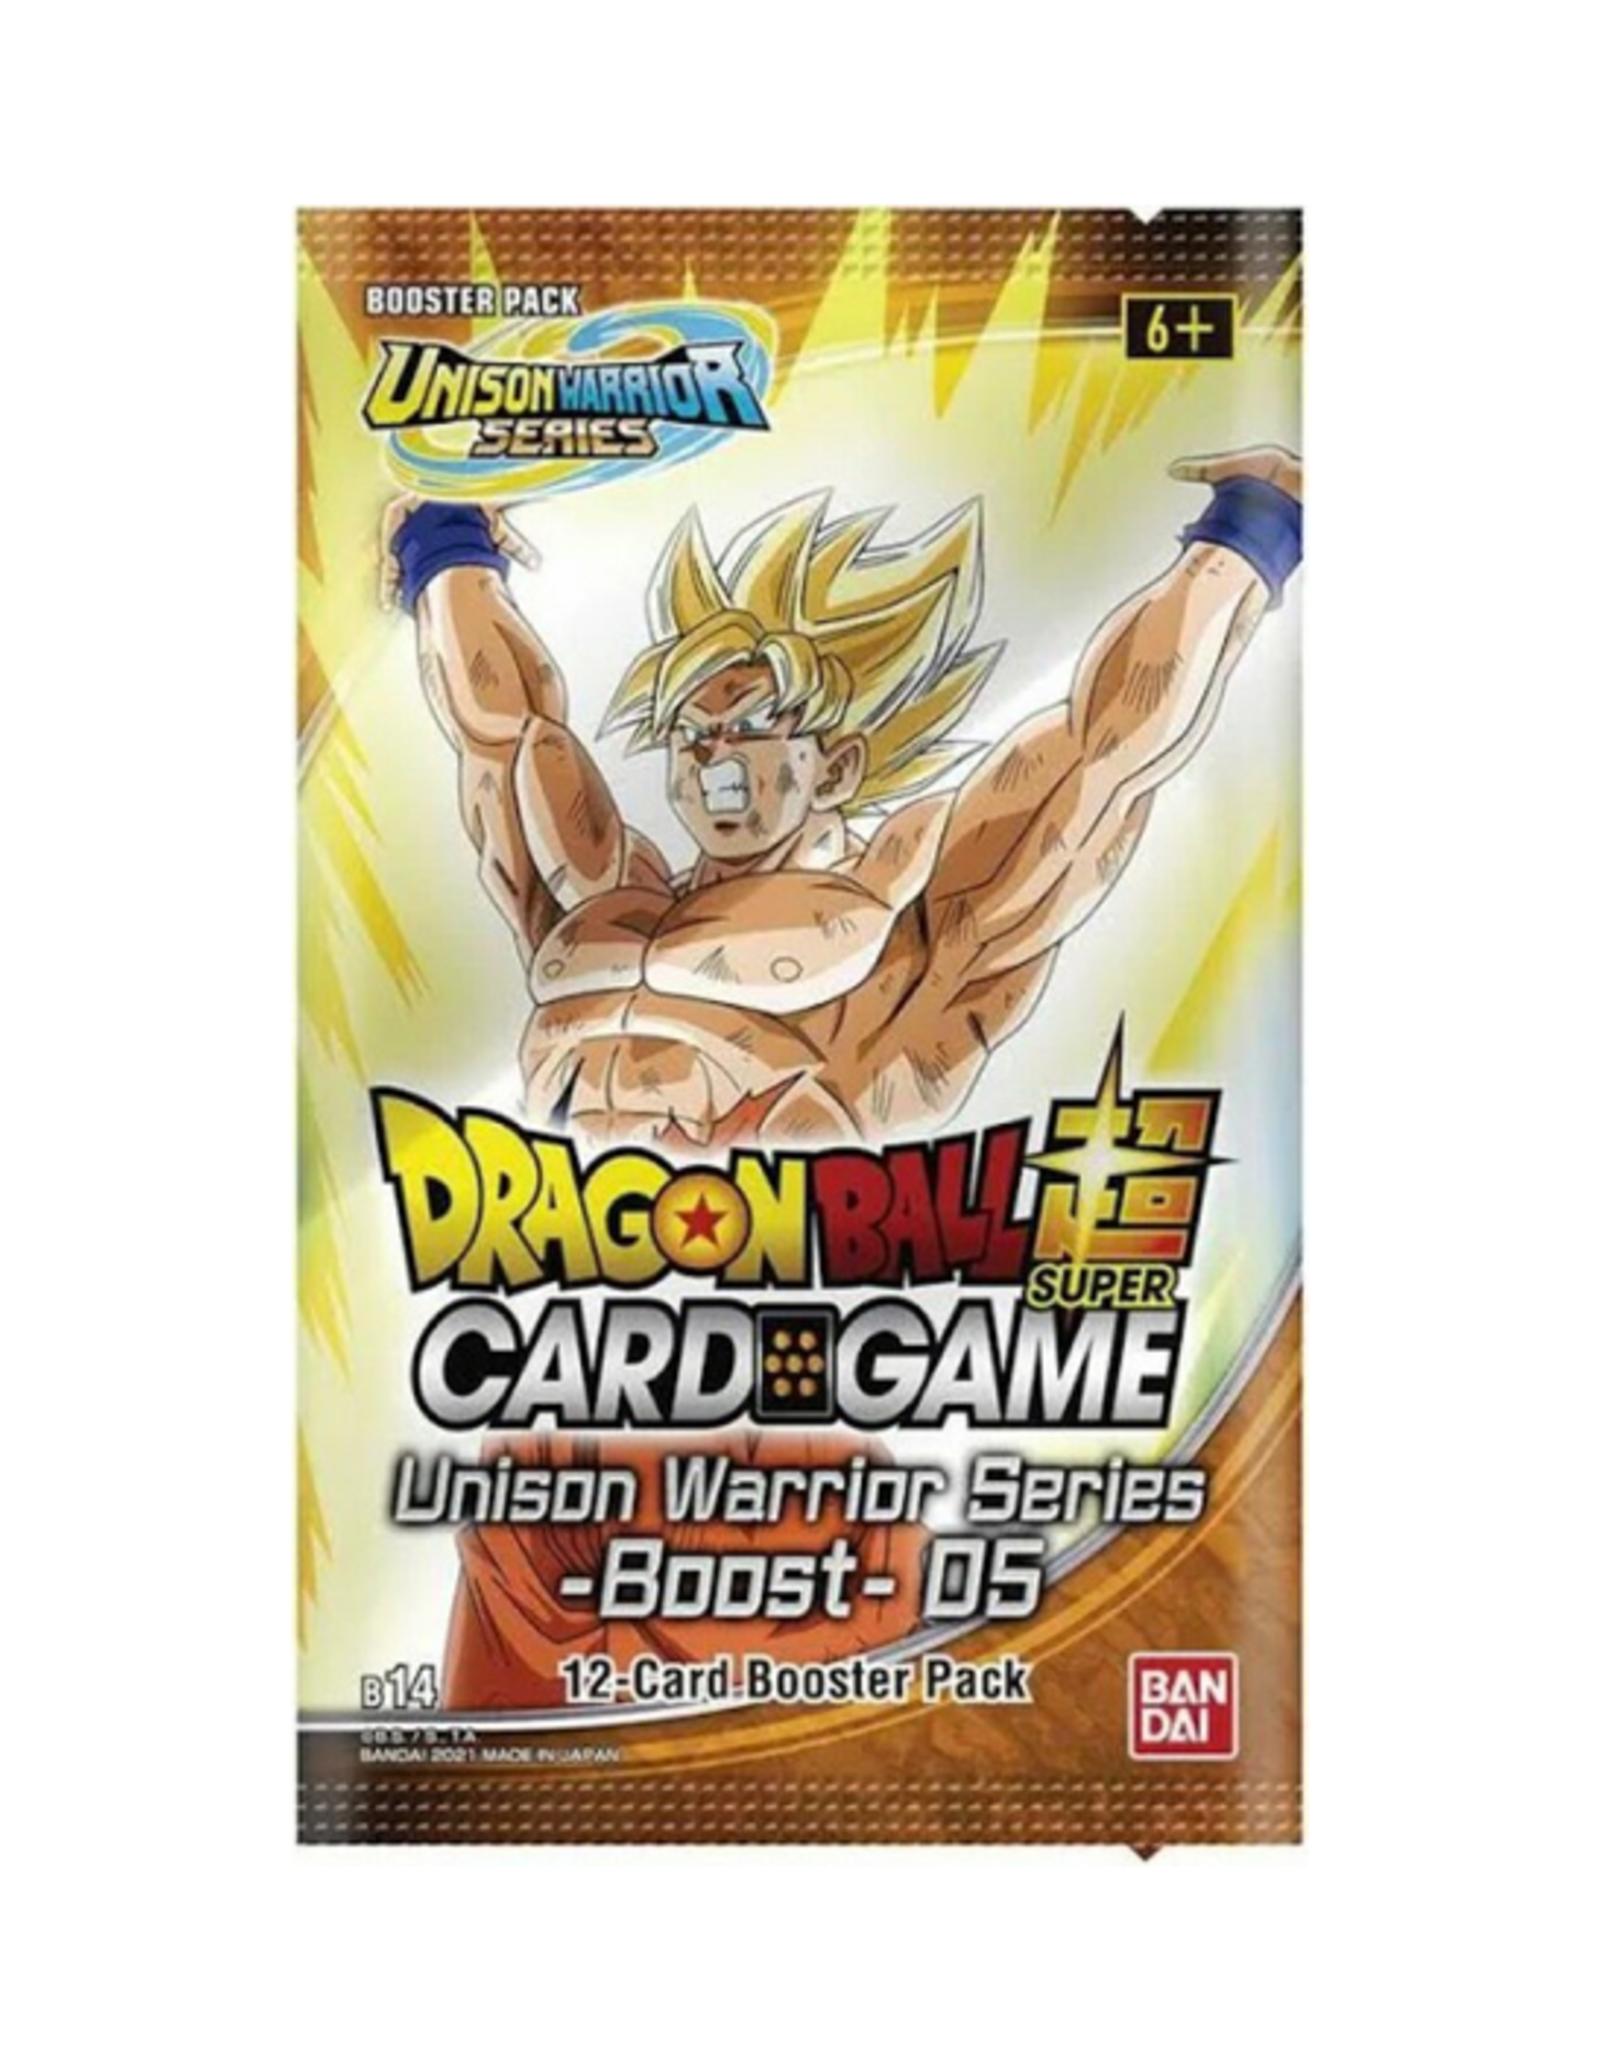 Bandai Dragon Ball Super: The Card Game - Cross Spirits - Booster Pack